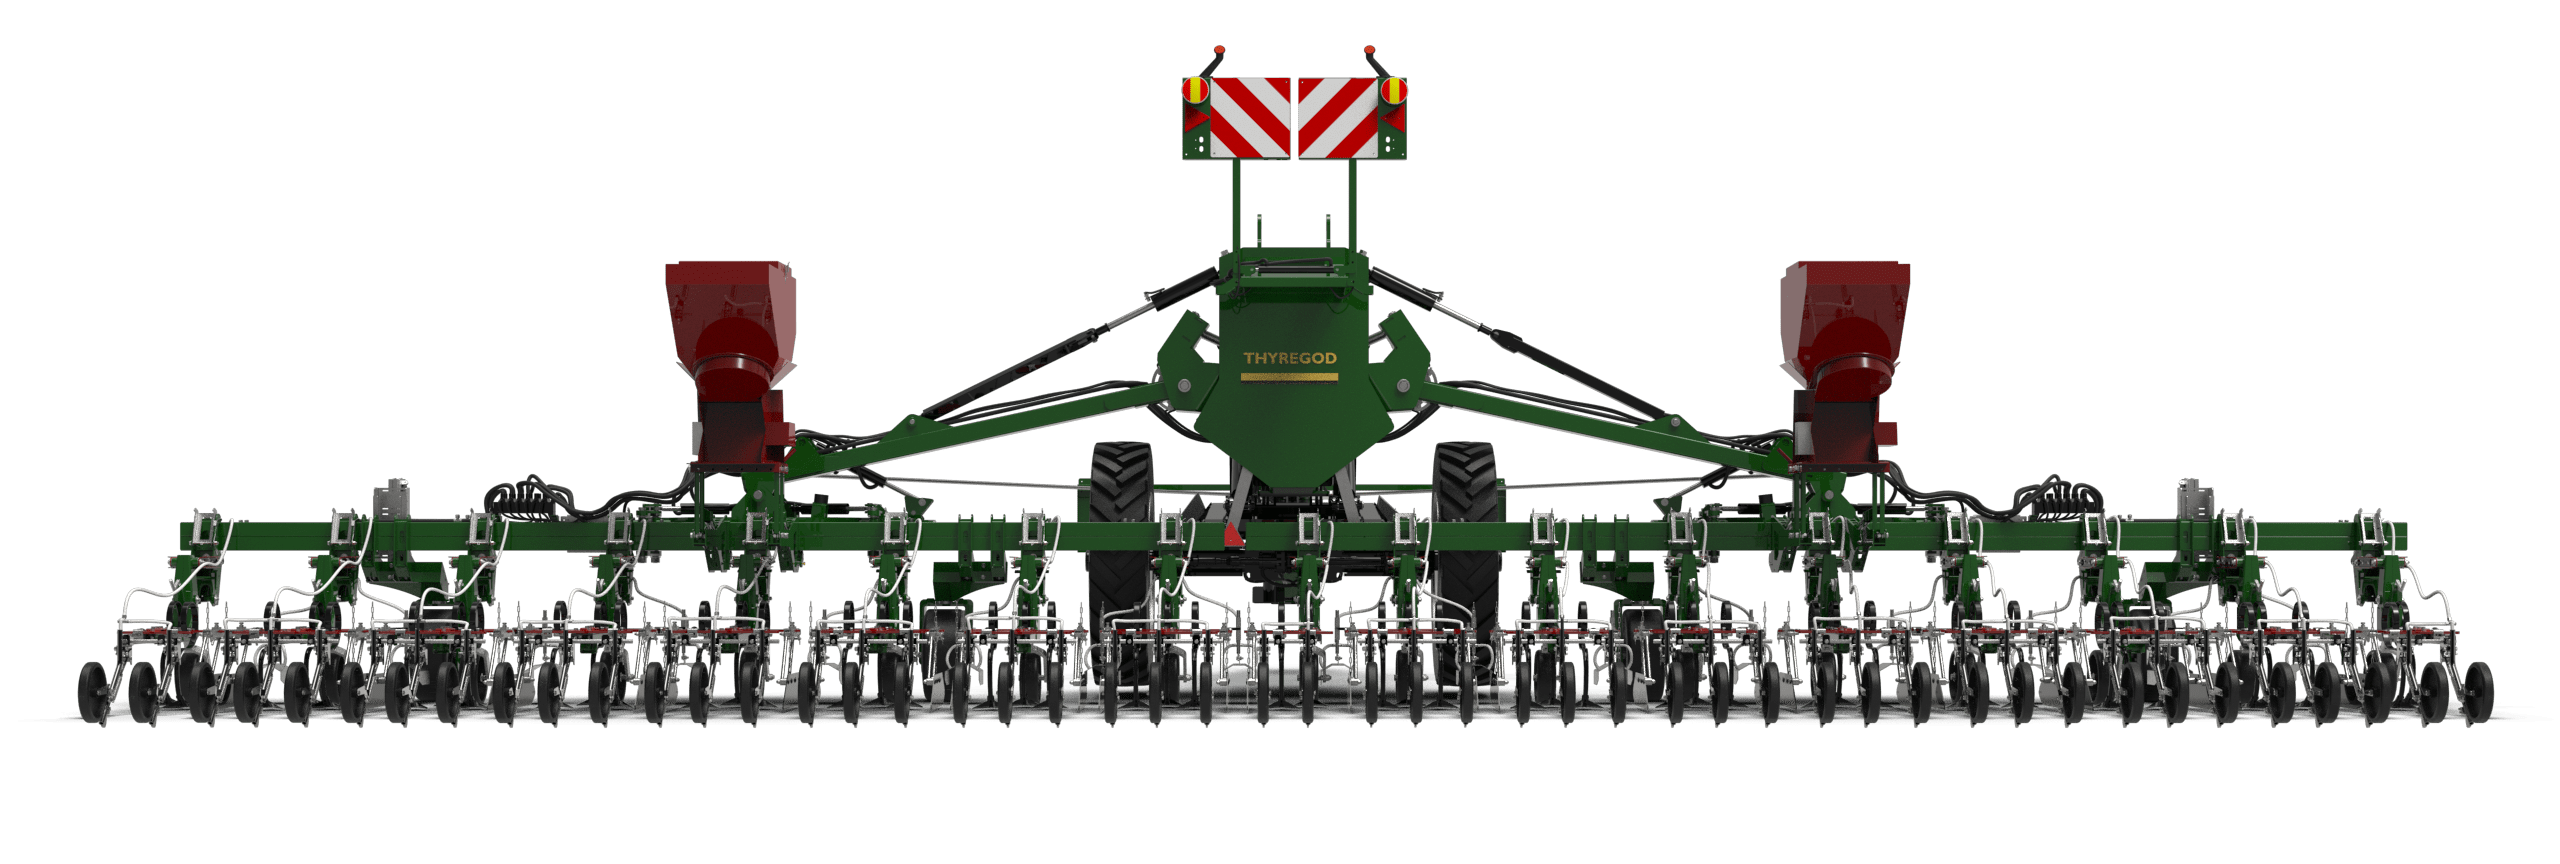 TRV Swingking radrenser med baandsprøojteudstyr